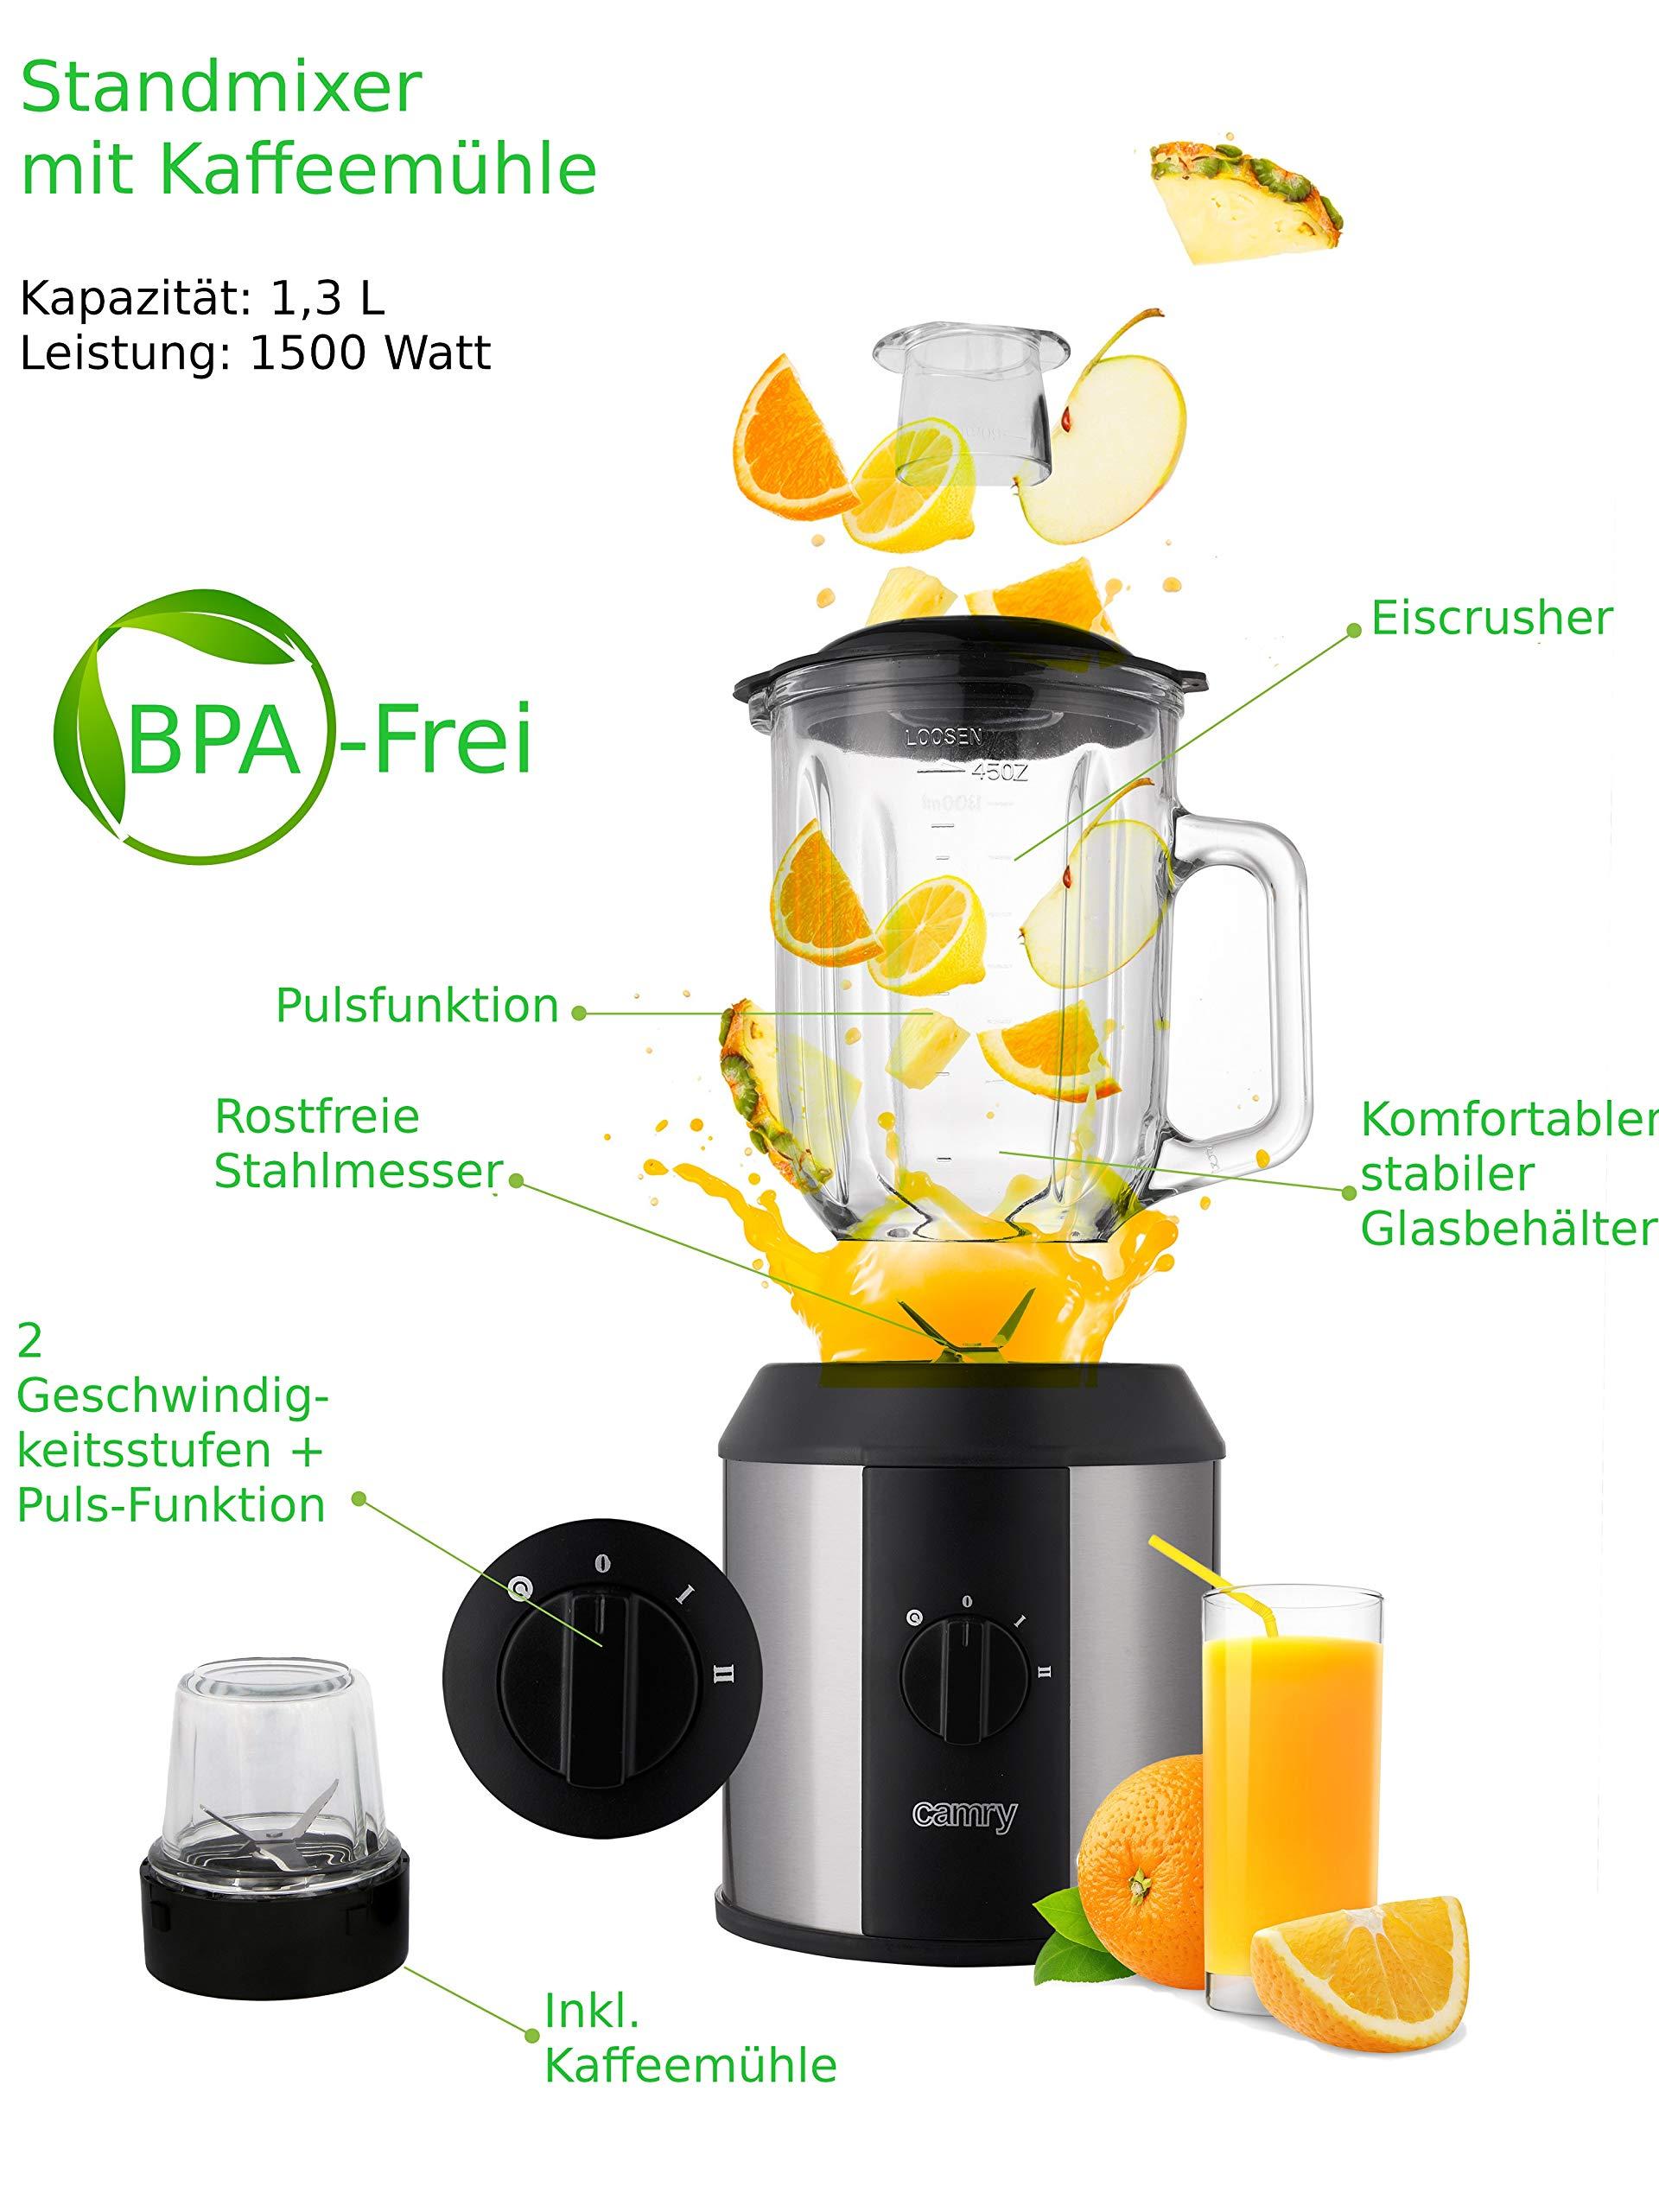 Standmixer-1500-Watt-Glas-Edelstahl-Smoothie-Maker-Mixer-Universal-Power-Mixer-13-Liter-4-Fach-Stahlmesser-Zerkleinerer-Eiwei-Shaker-Ice-Crusher-Eis-Crusher